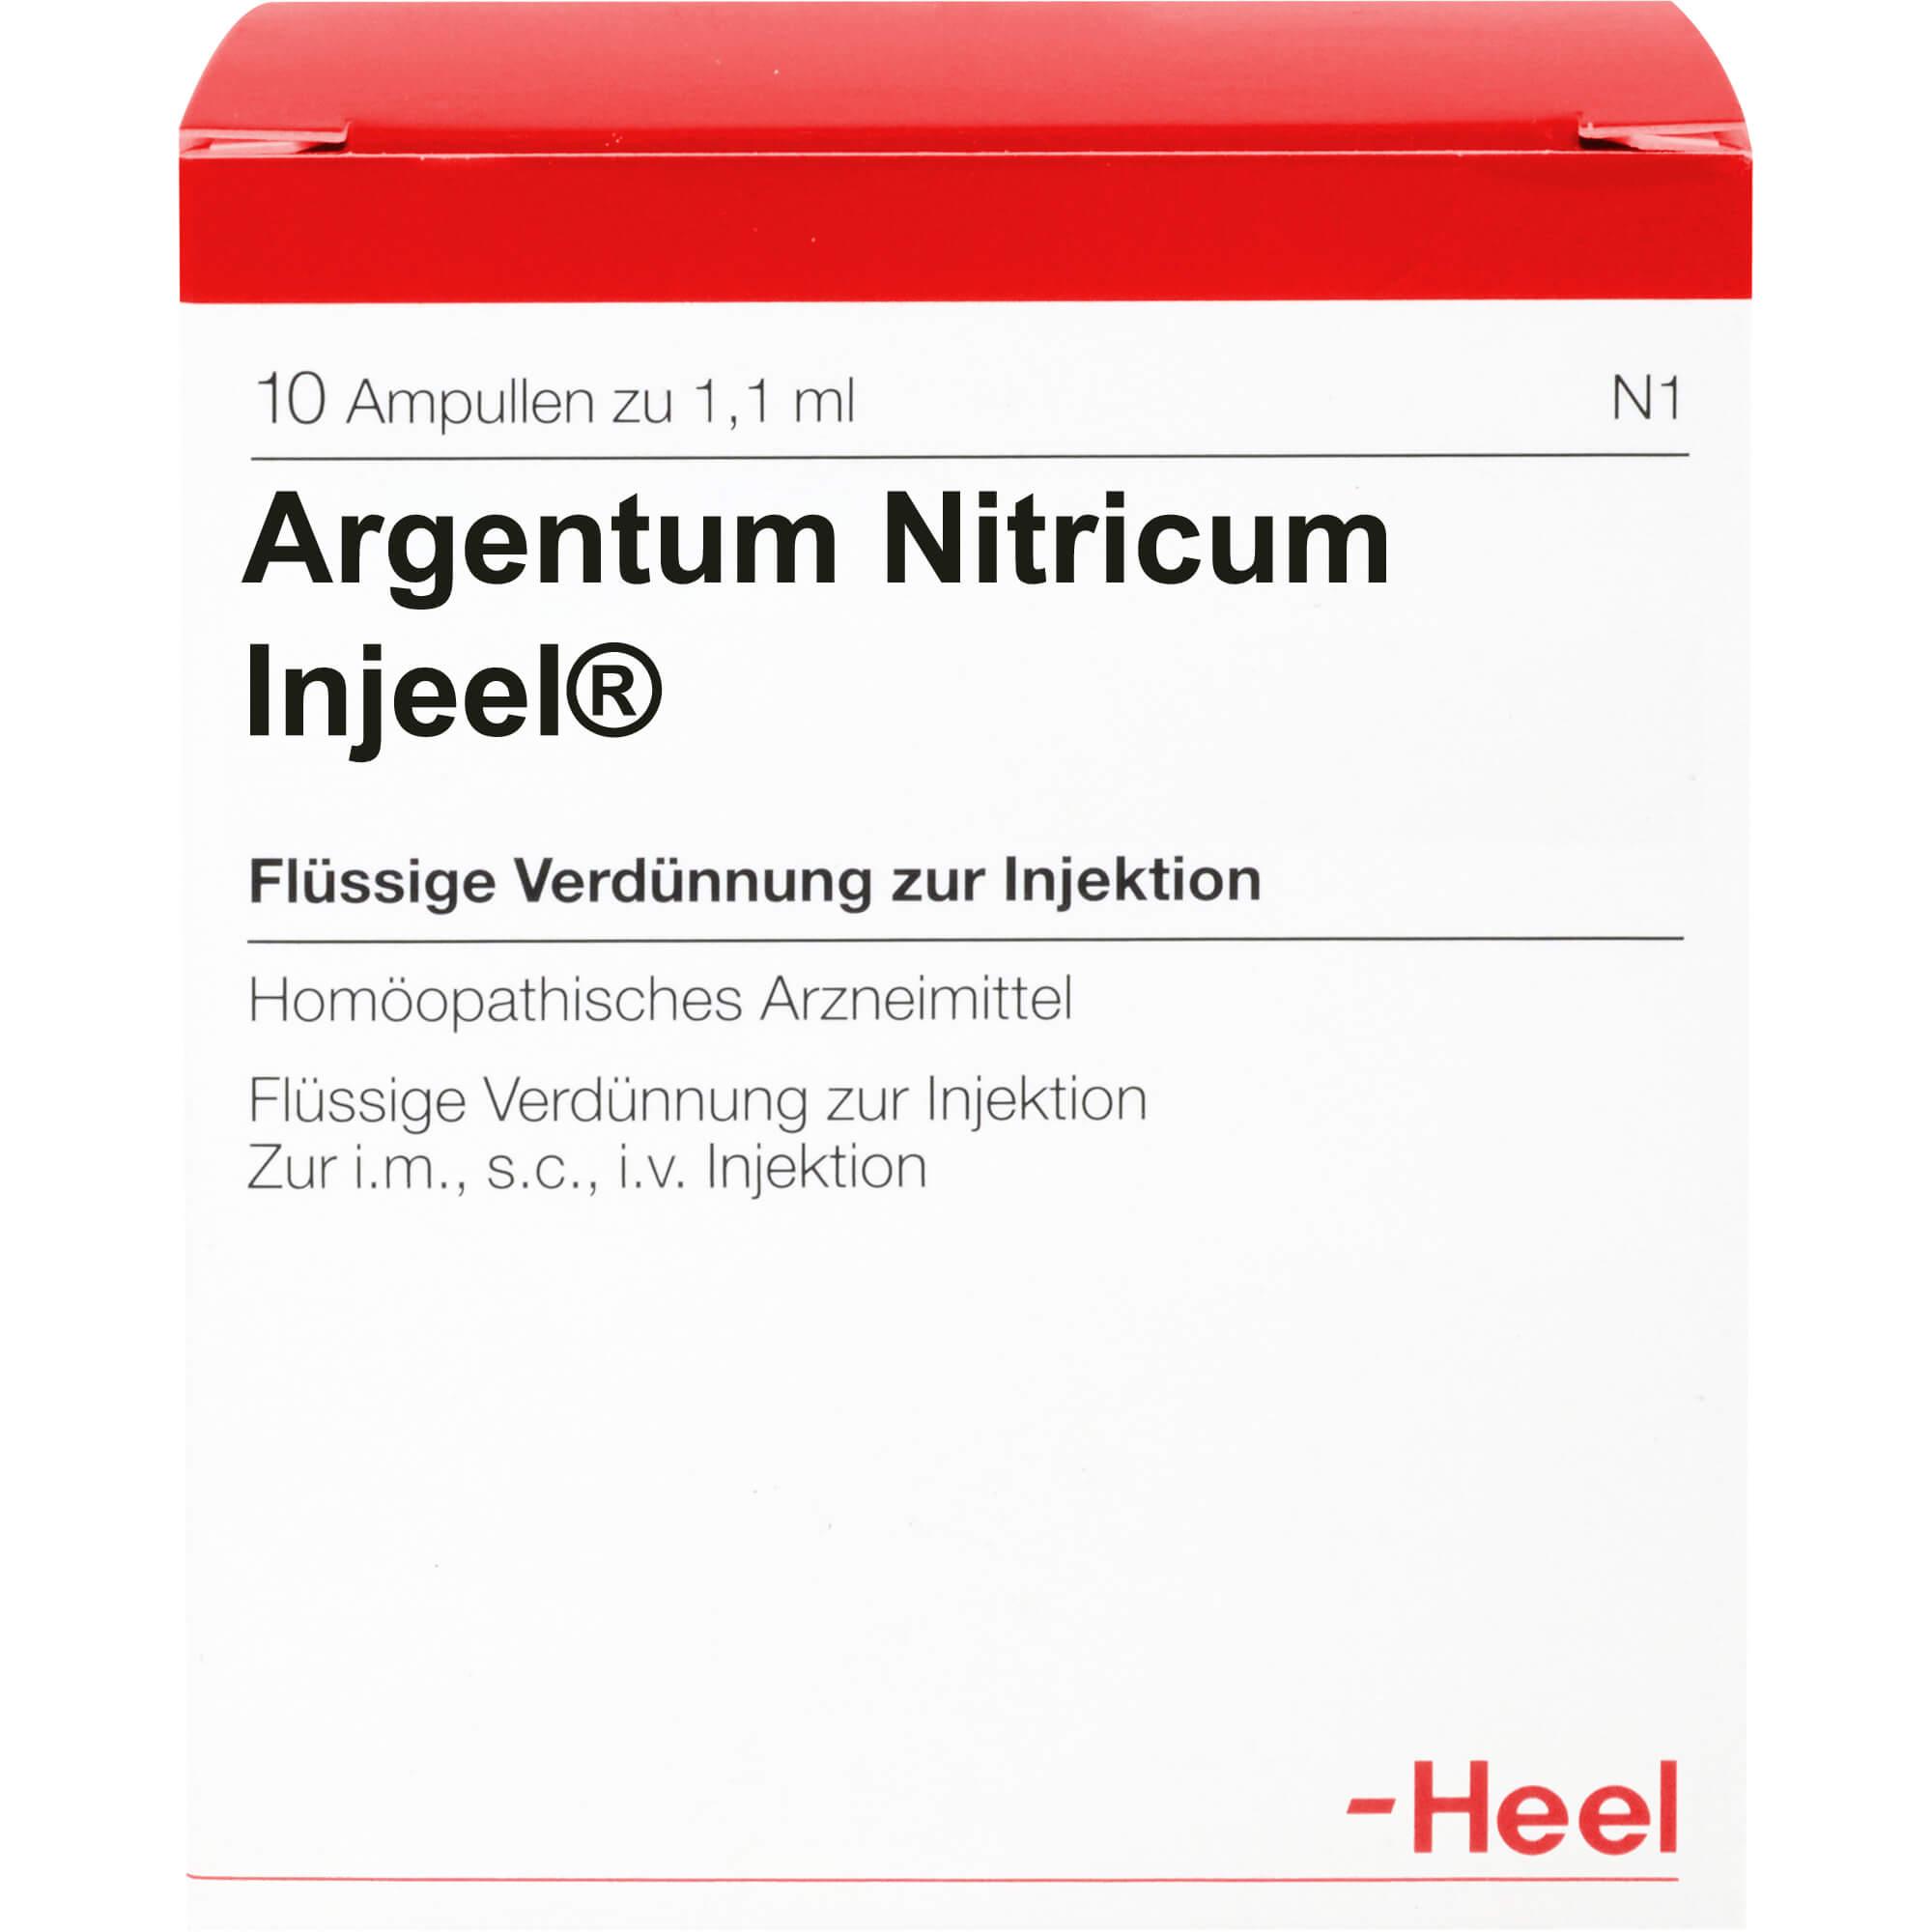 ARGENTUM-NITRICUM-INJEEL-Ampullen